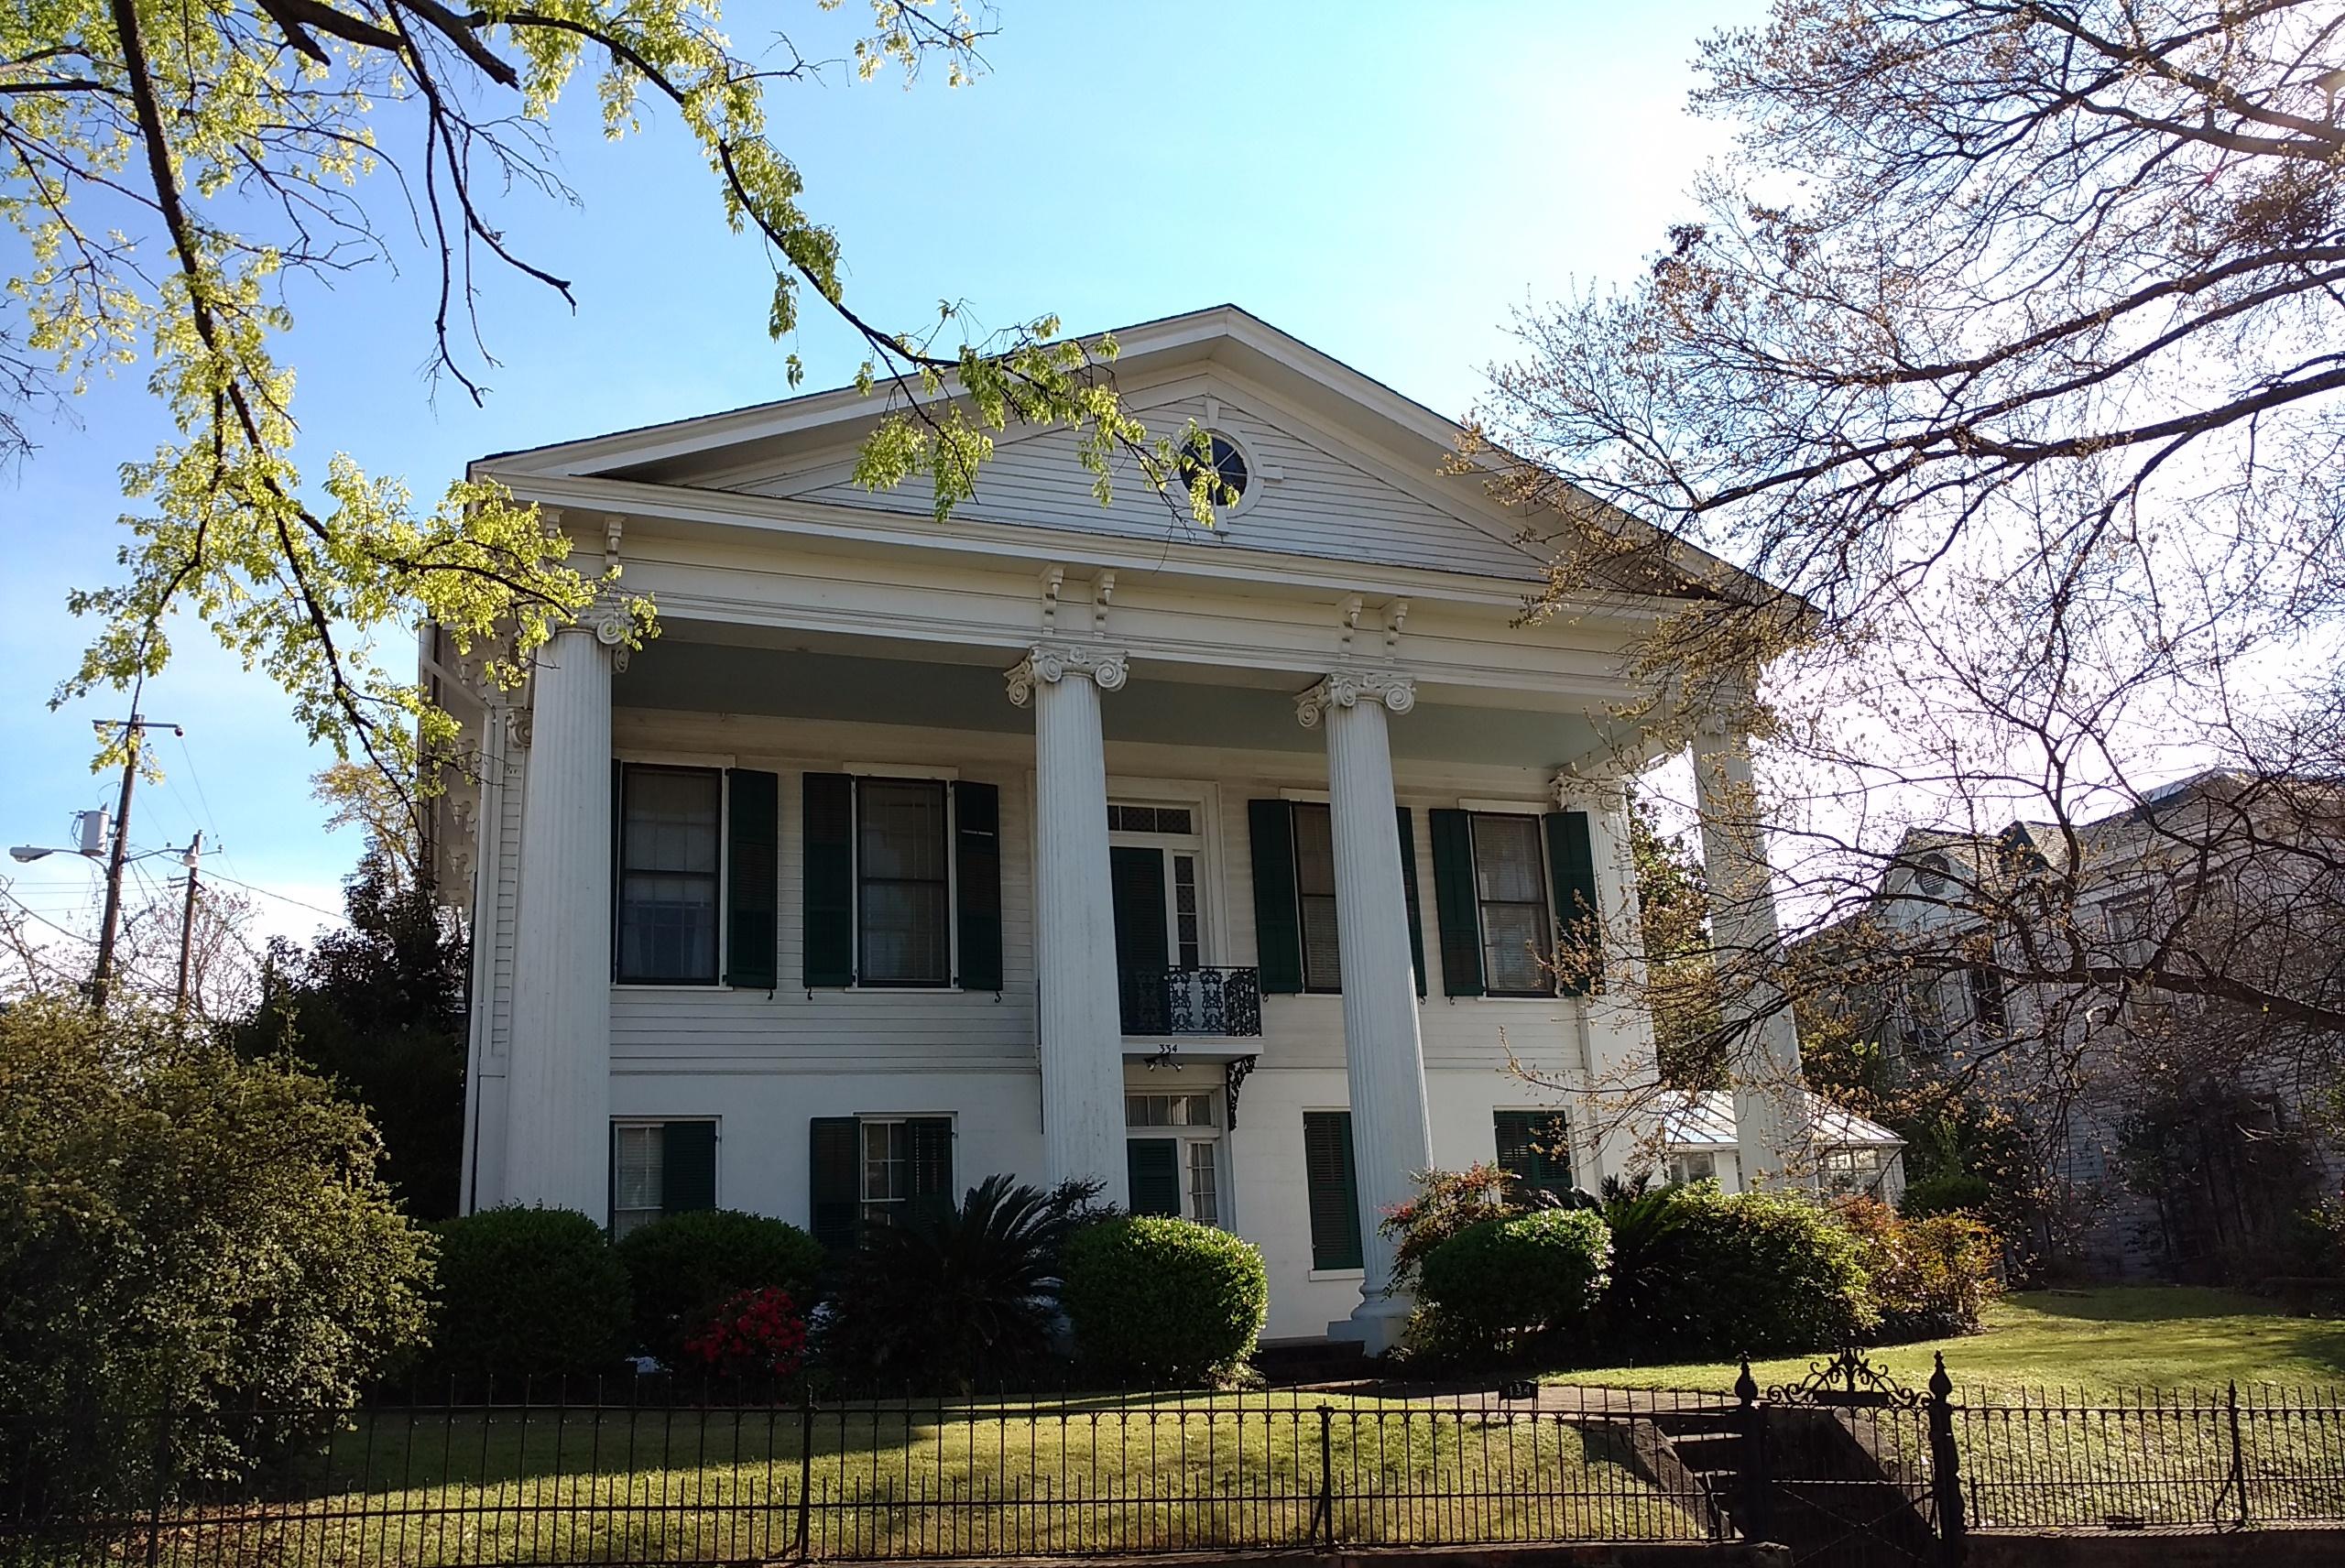 Montgomery-Traditional-House-Upper-Class-Van-Wersch-Writes